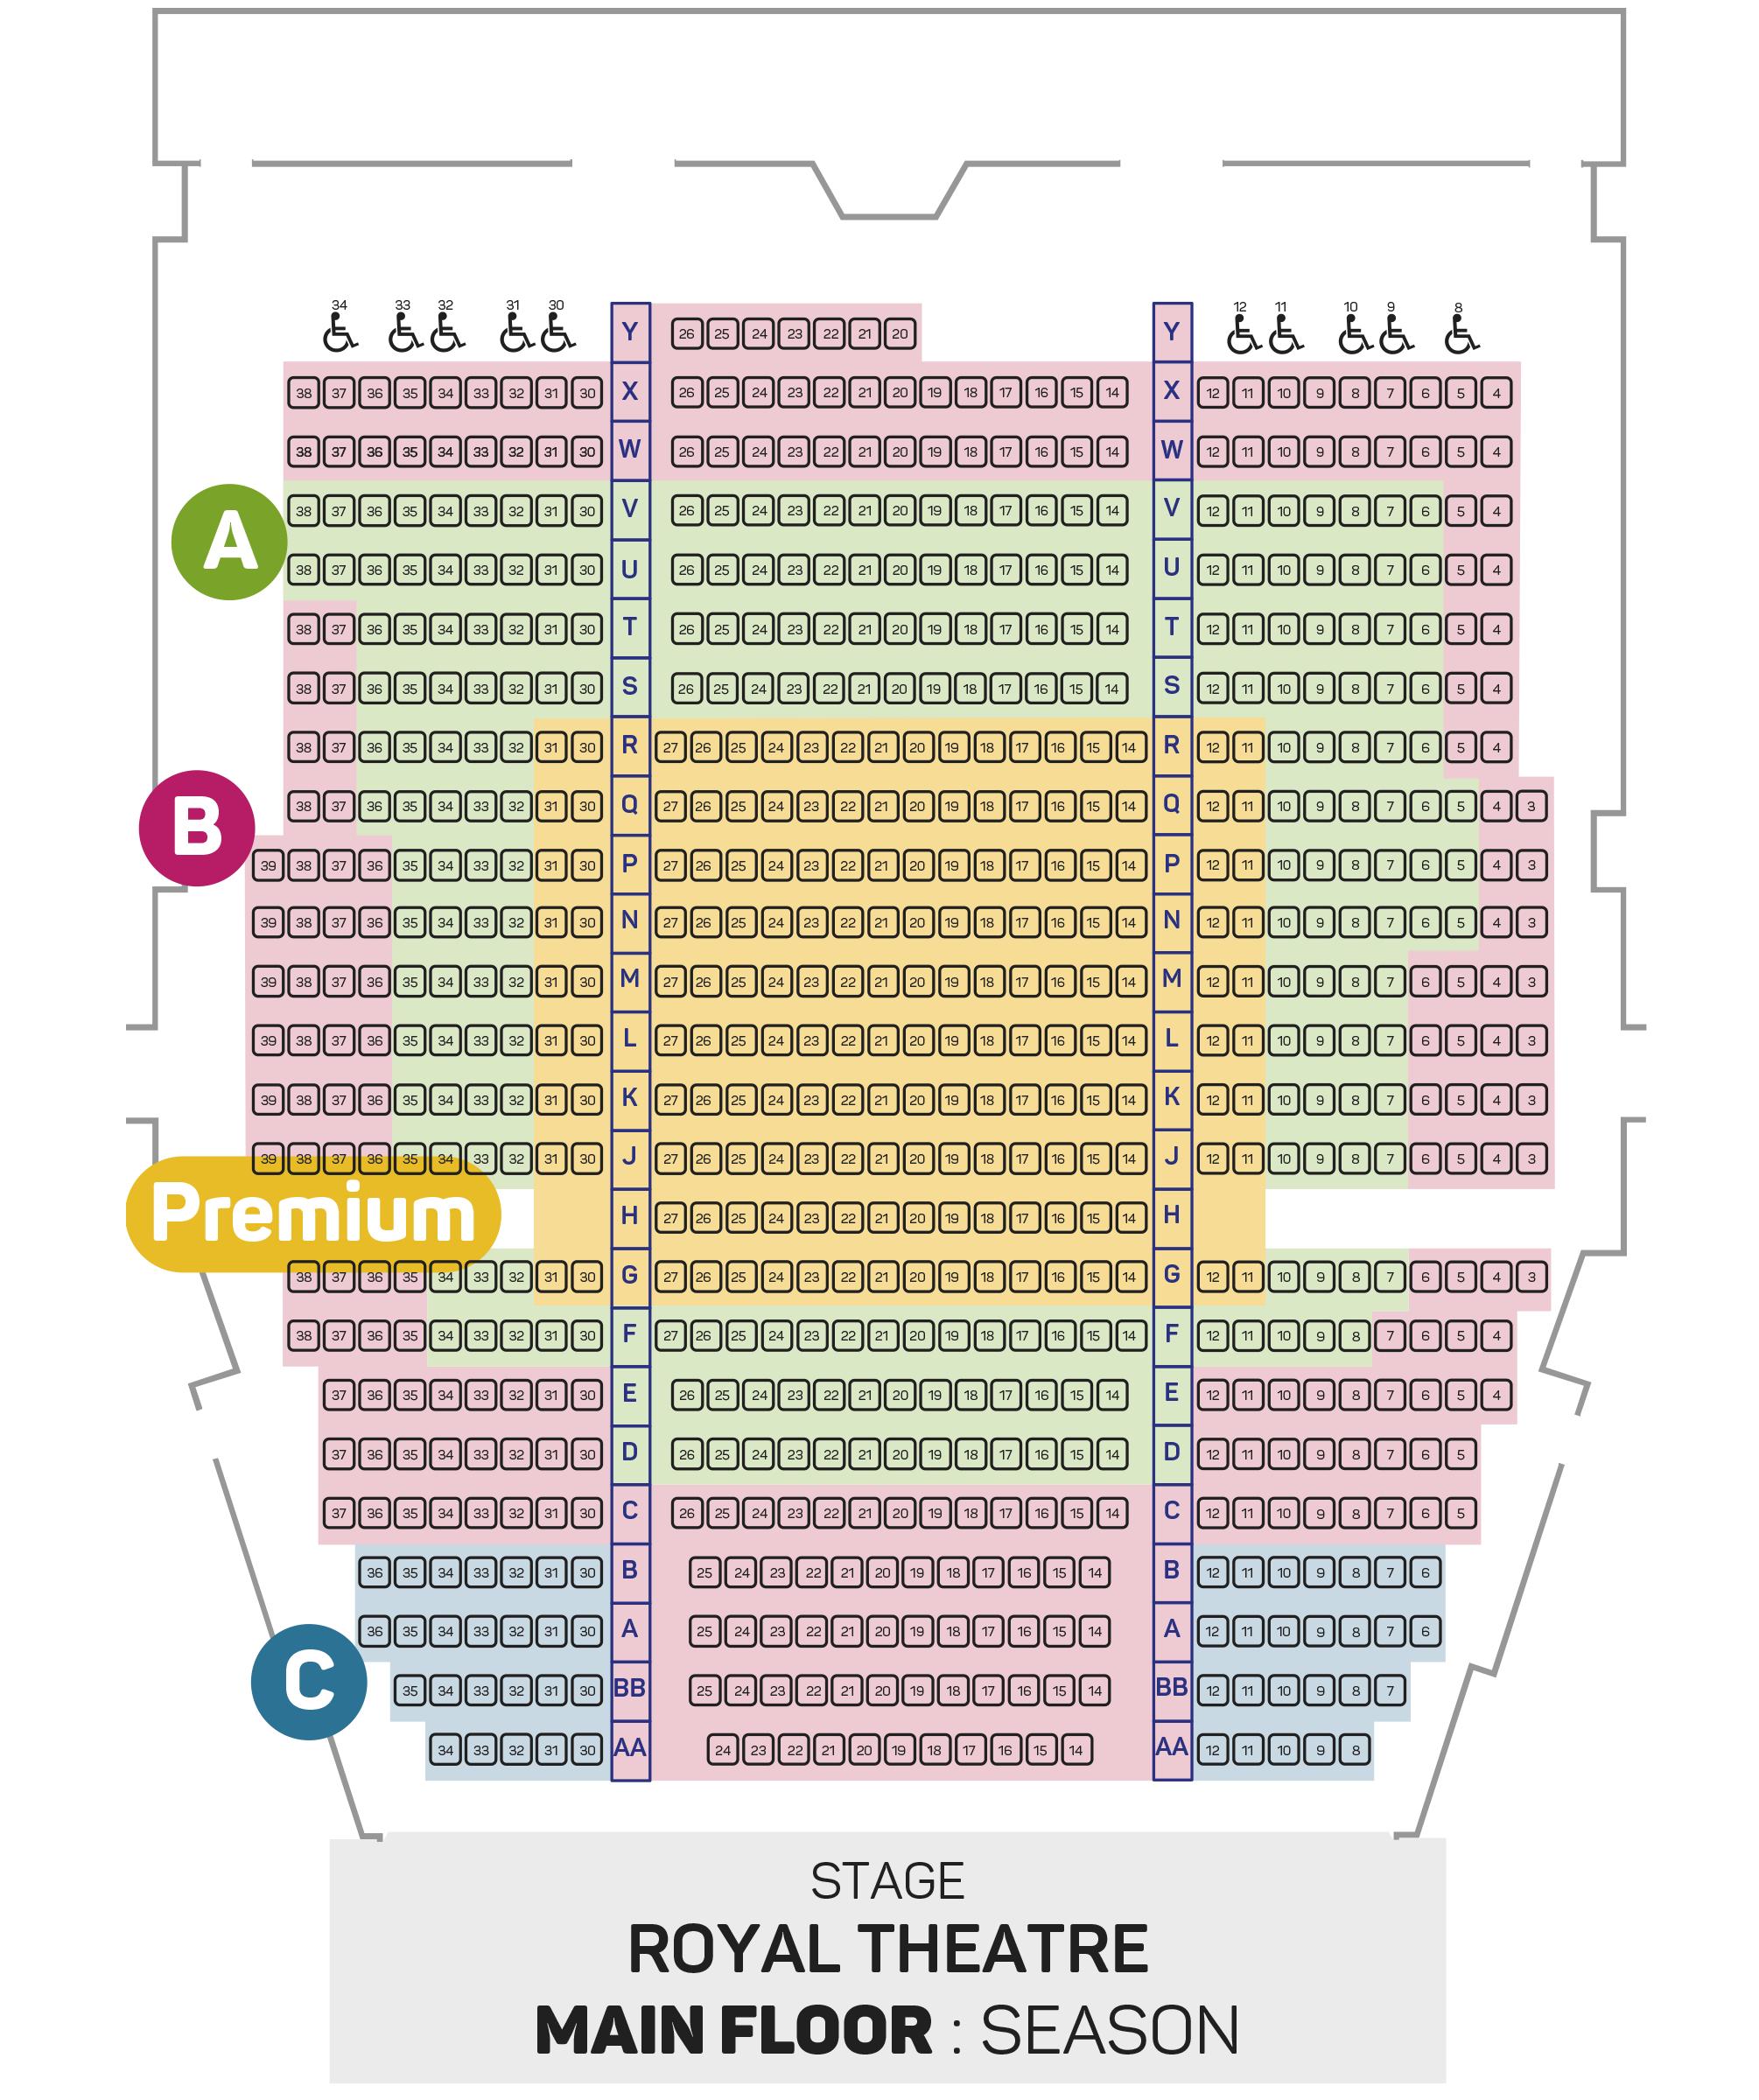 Royal Subscription Seating Plan - Main Floor